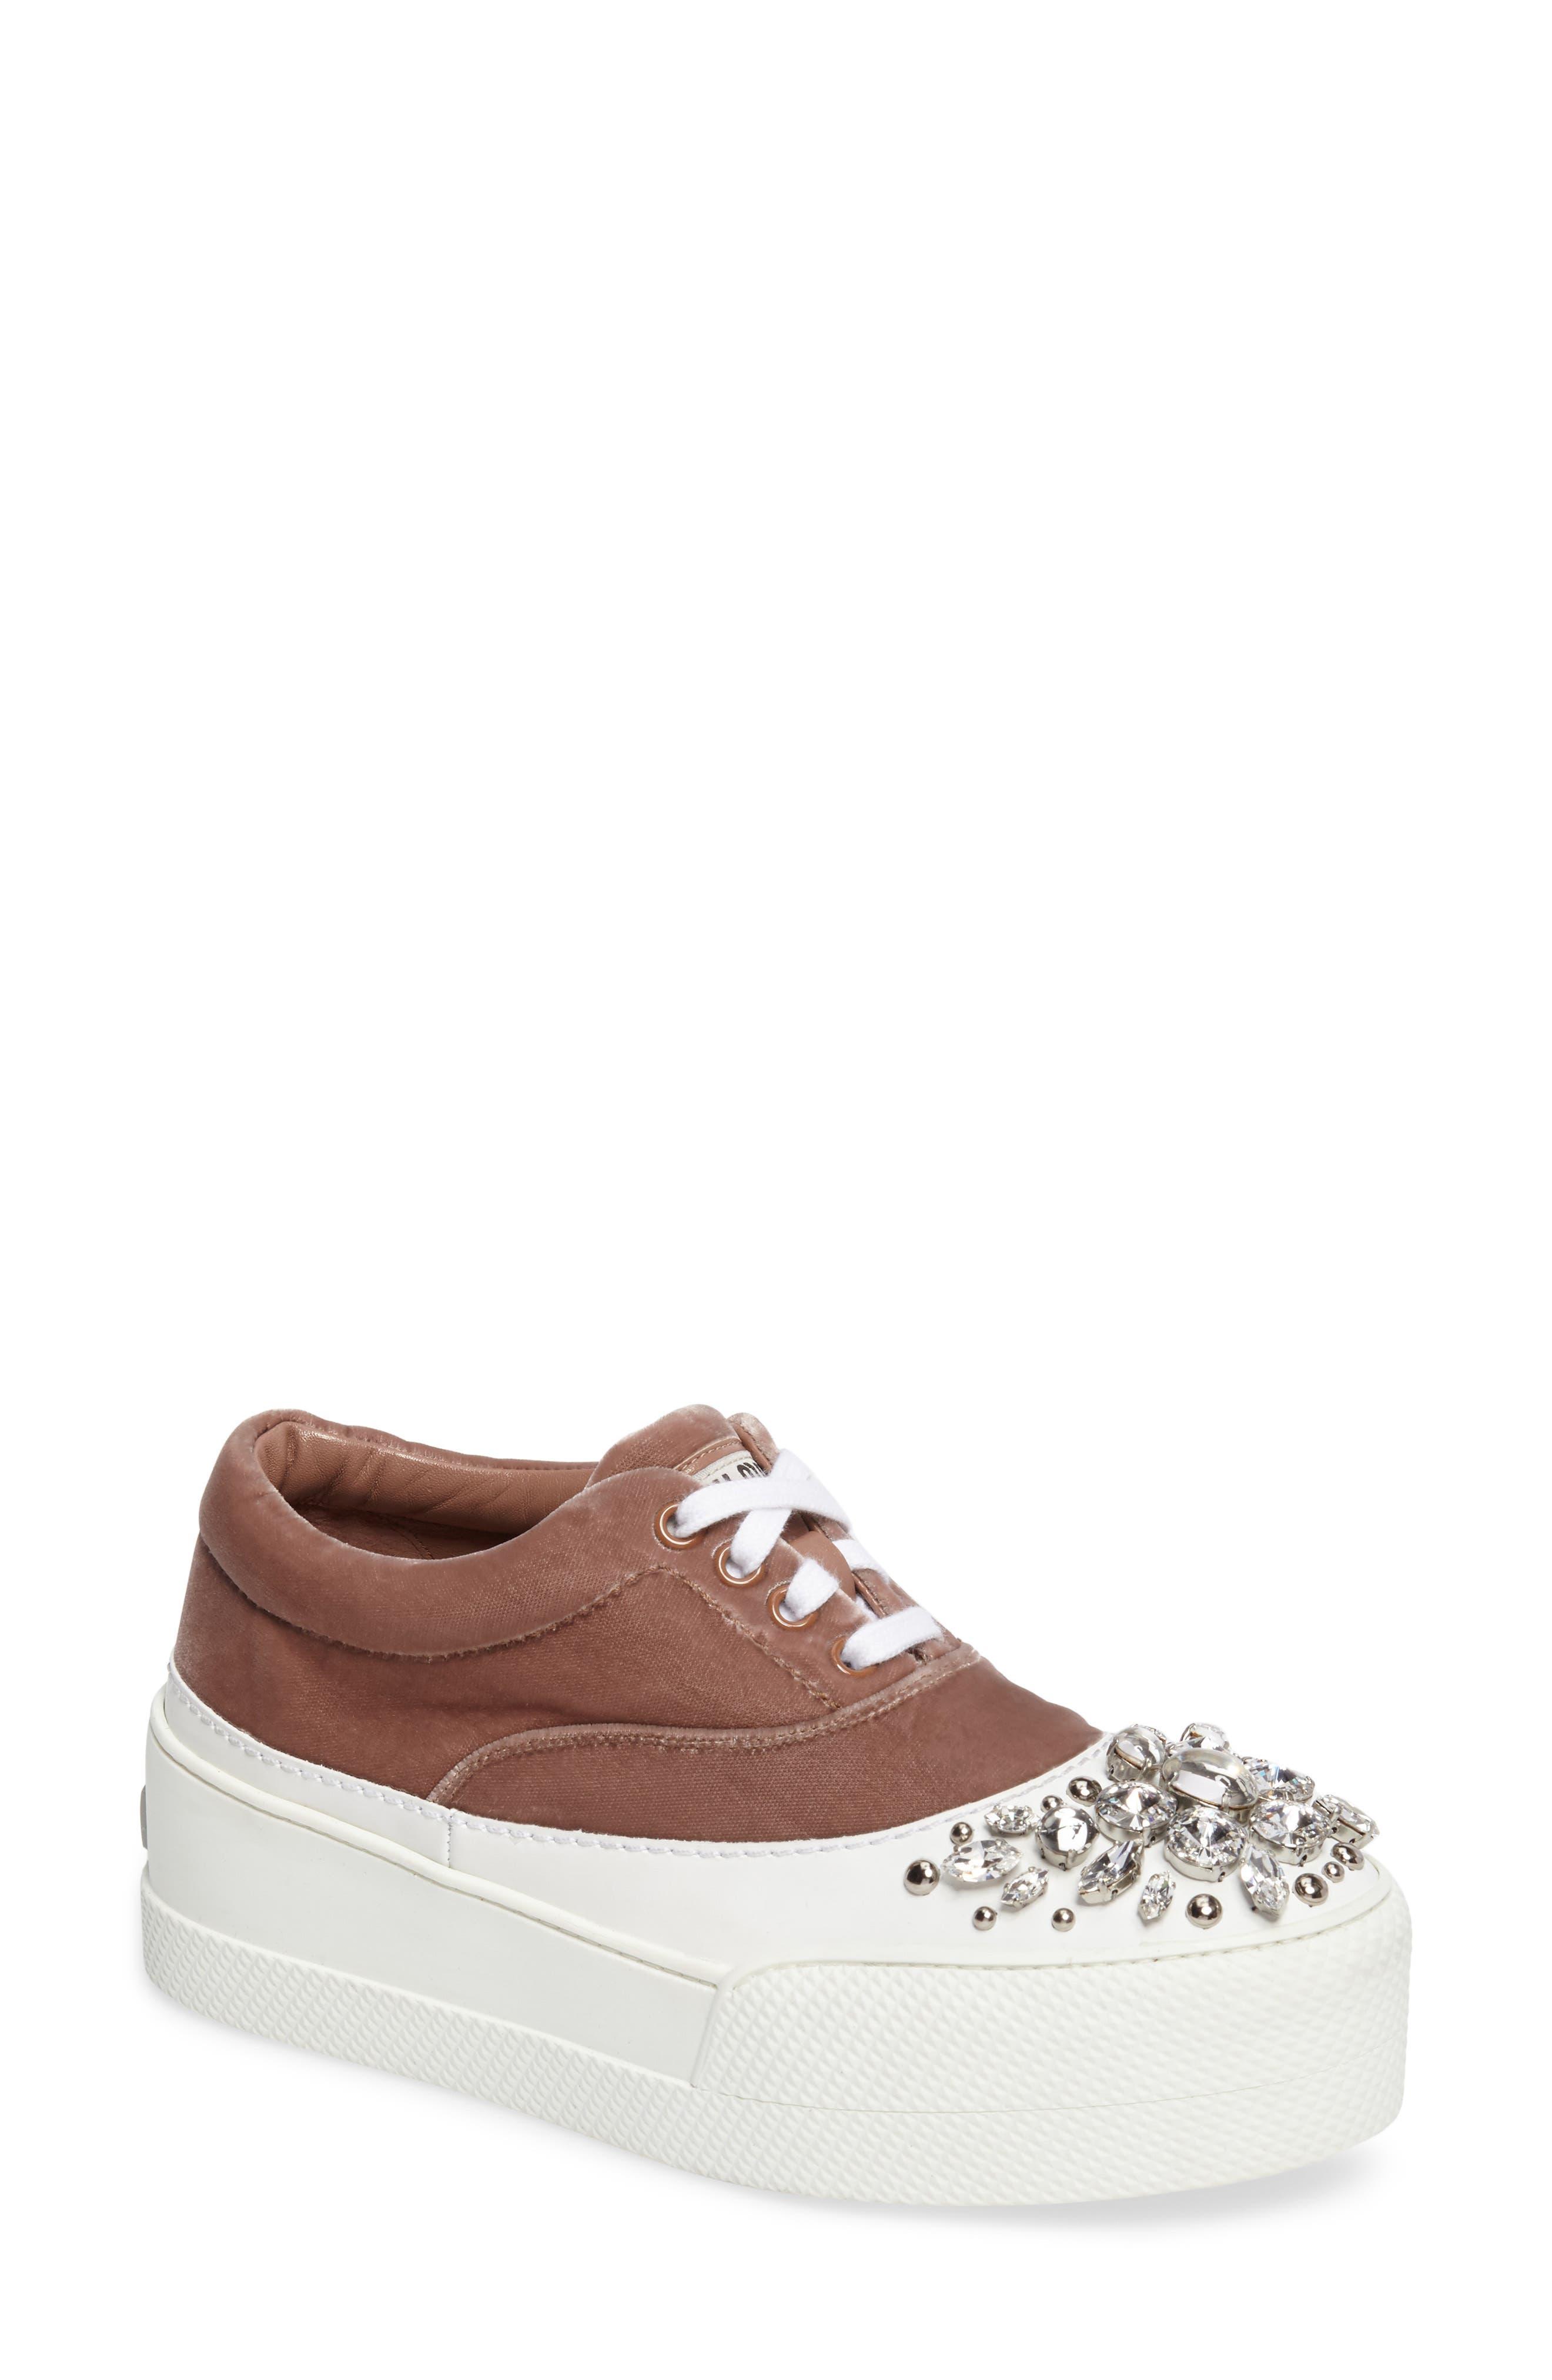 Alternate Image 1 Selected - Miu Miu Embellished Flatform Sneaker (Women)